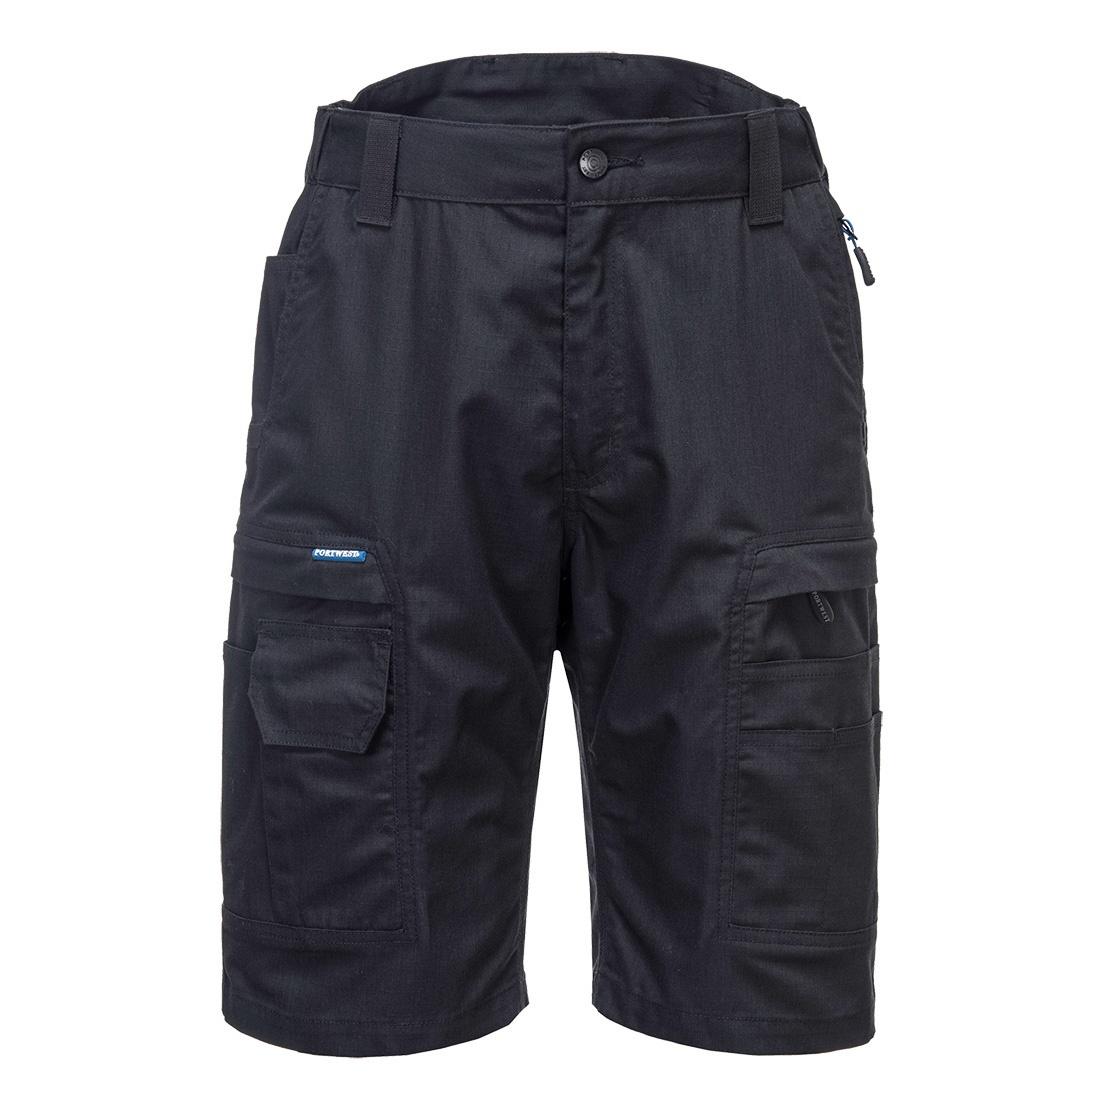 Portwest KX3 Ripstop Shorts - Black